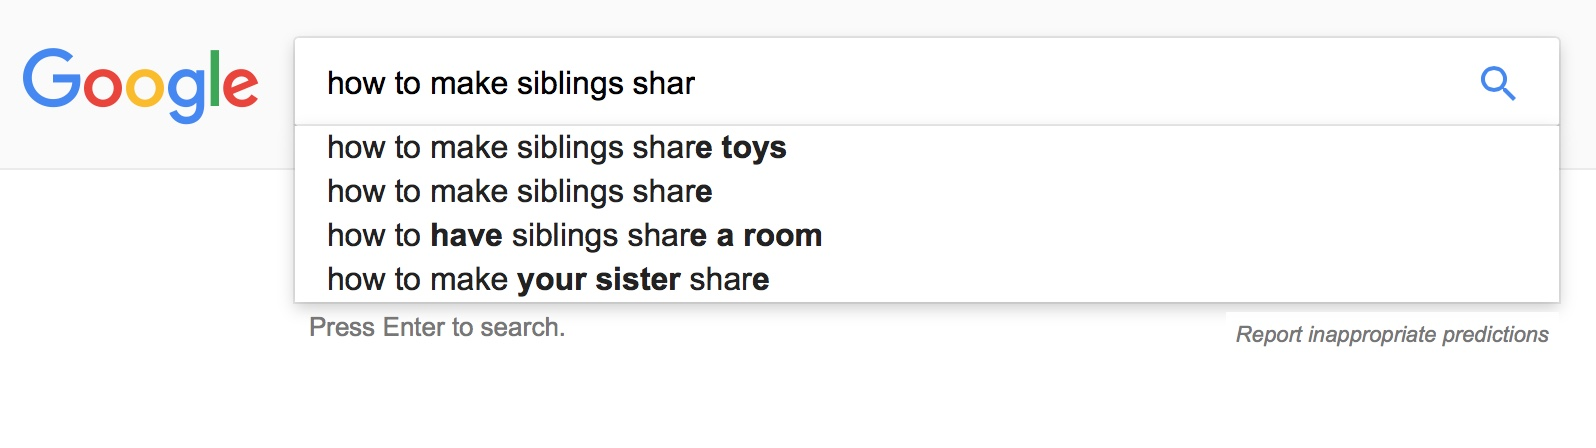 sharesearch